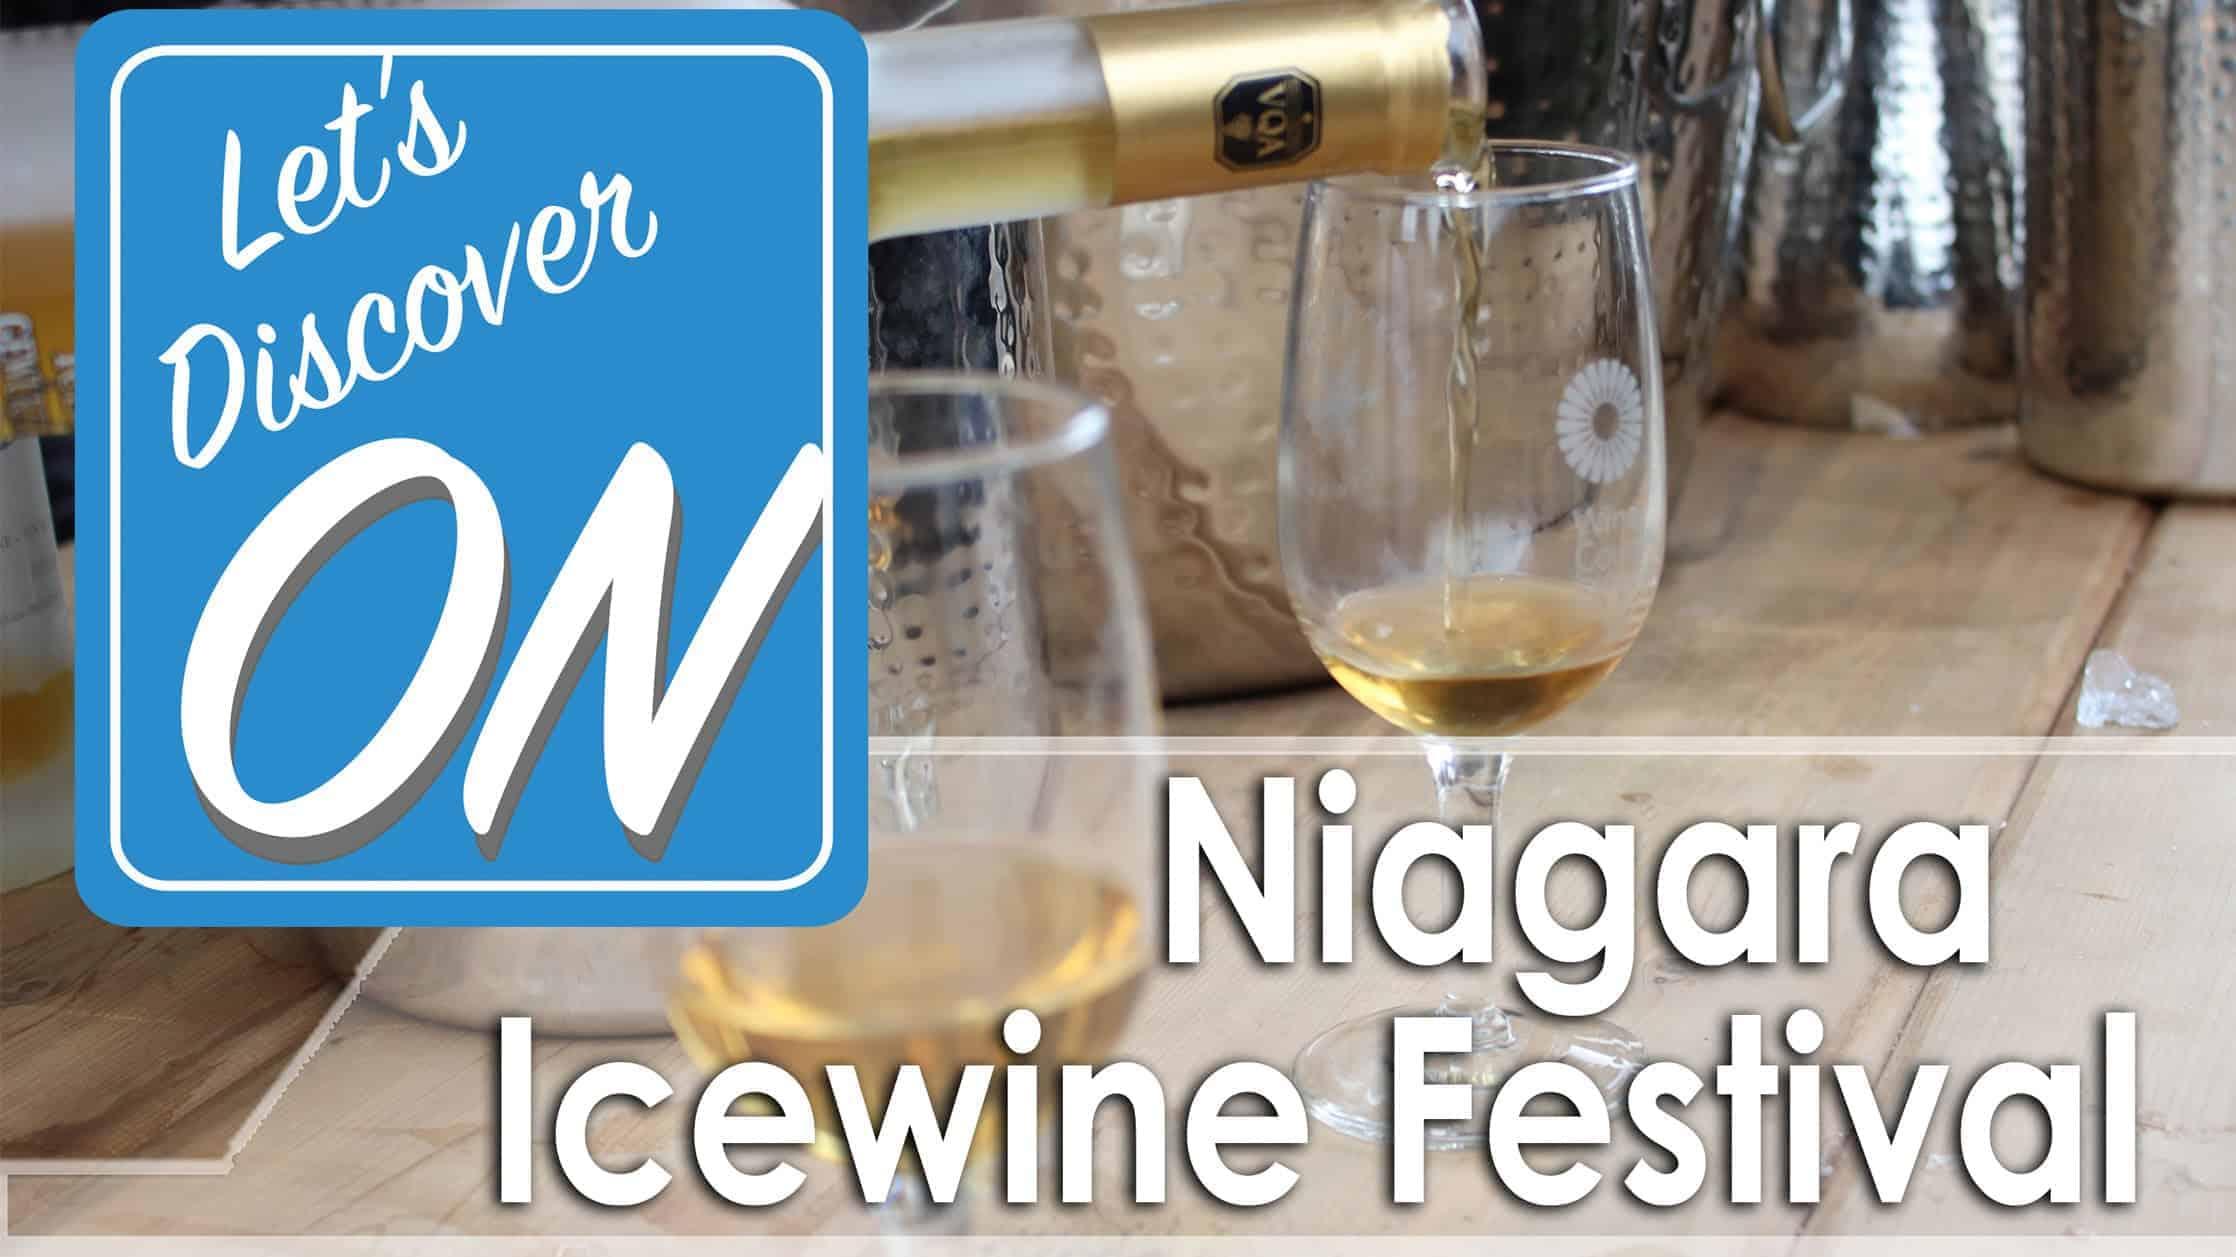 Let's Discover ON - Niagara Icewine Festival